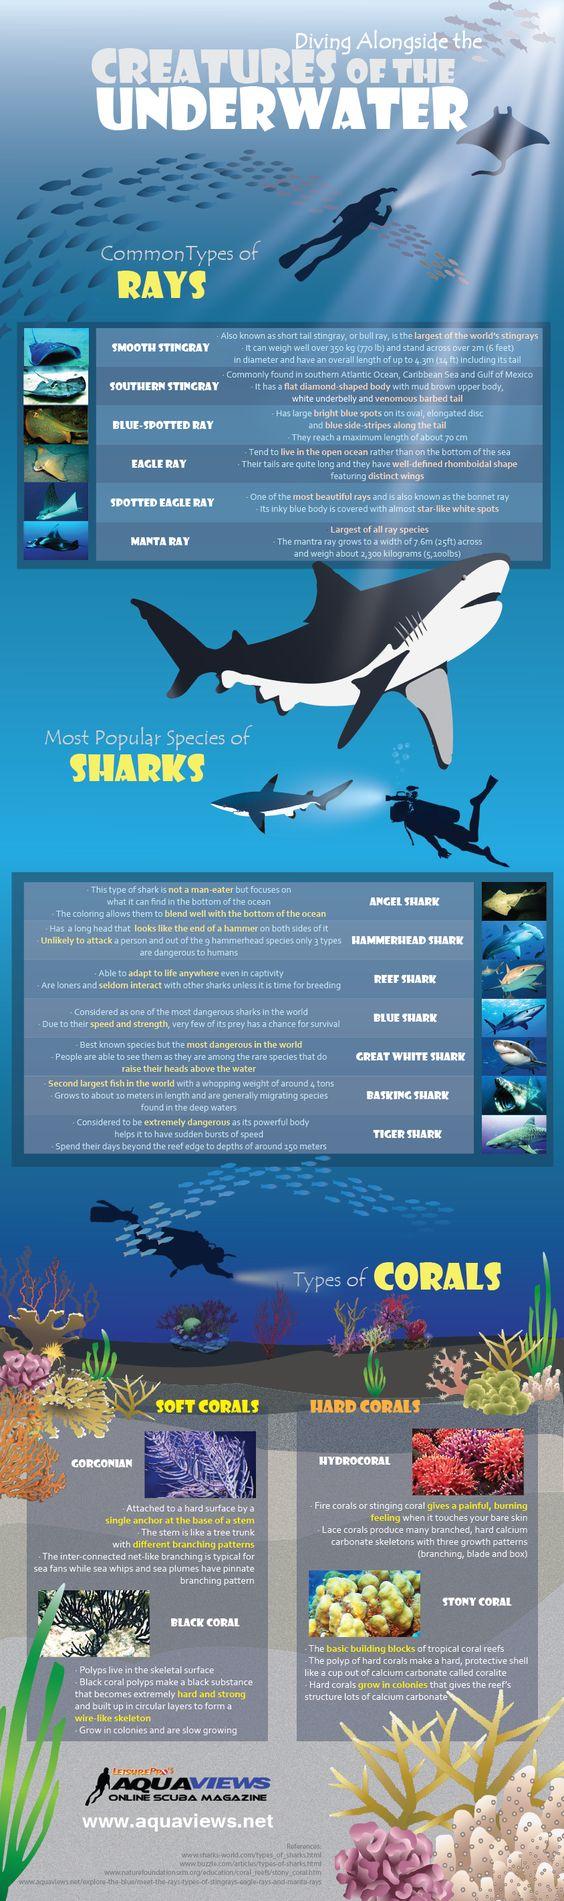 Creatures of the Underwater infographic